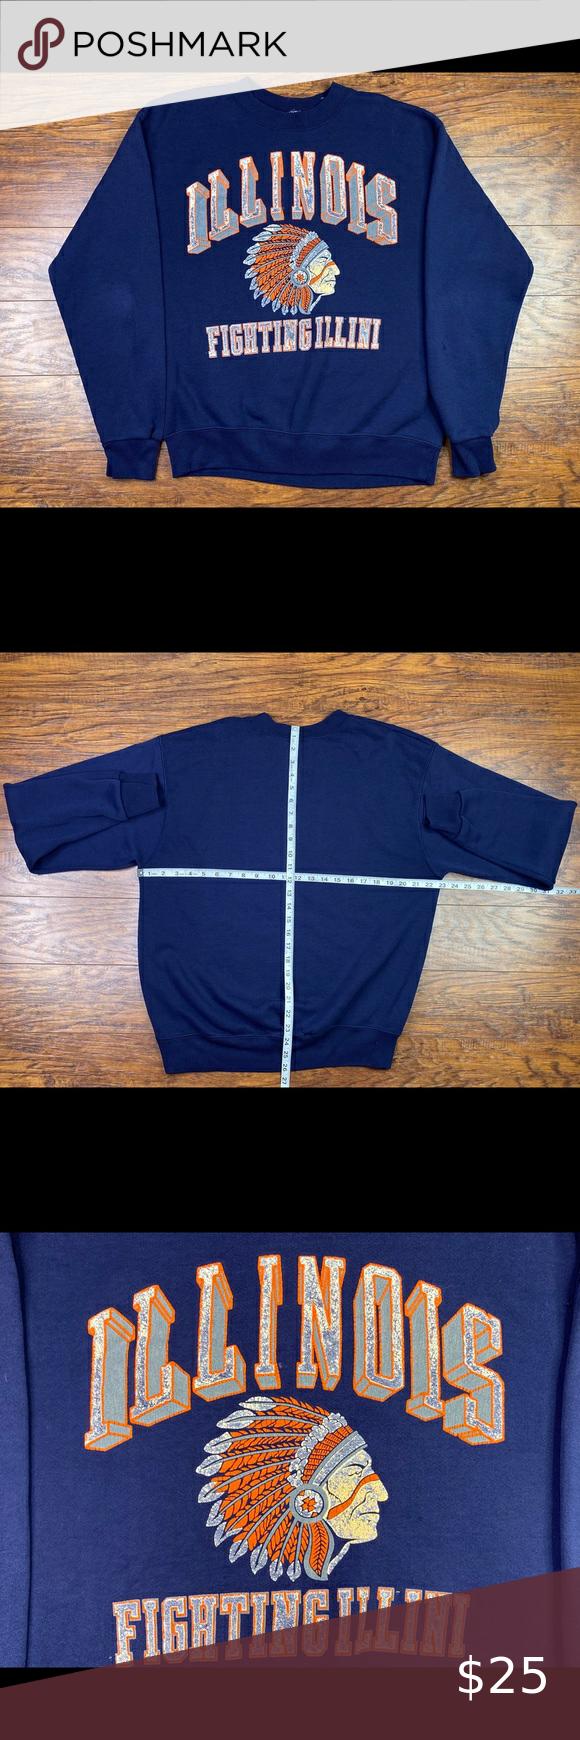 Vintage Illinois Fighting Illini Sweatshirt Good Condition Smoke And Pet Free Home Ships Within 24hrs Monday Sweatshirt Shirt Sweatshirts Sweatshirts Hoodie [ 1740 x 580 Pixel ]